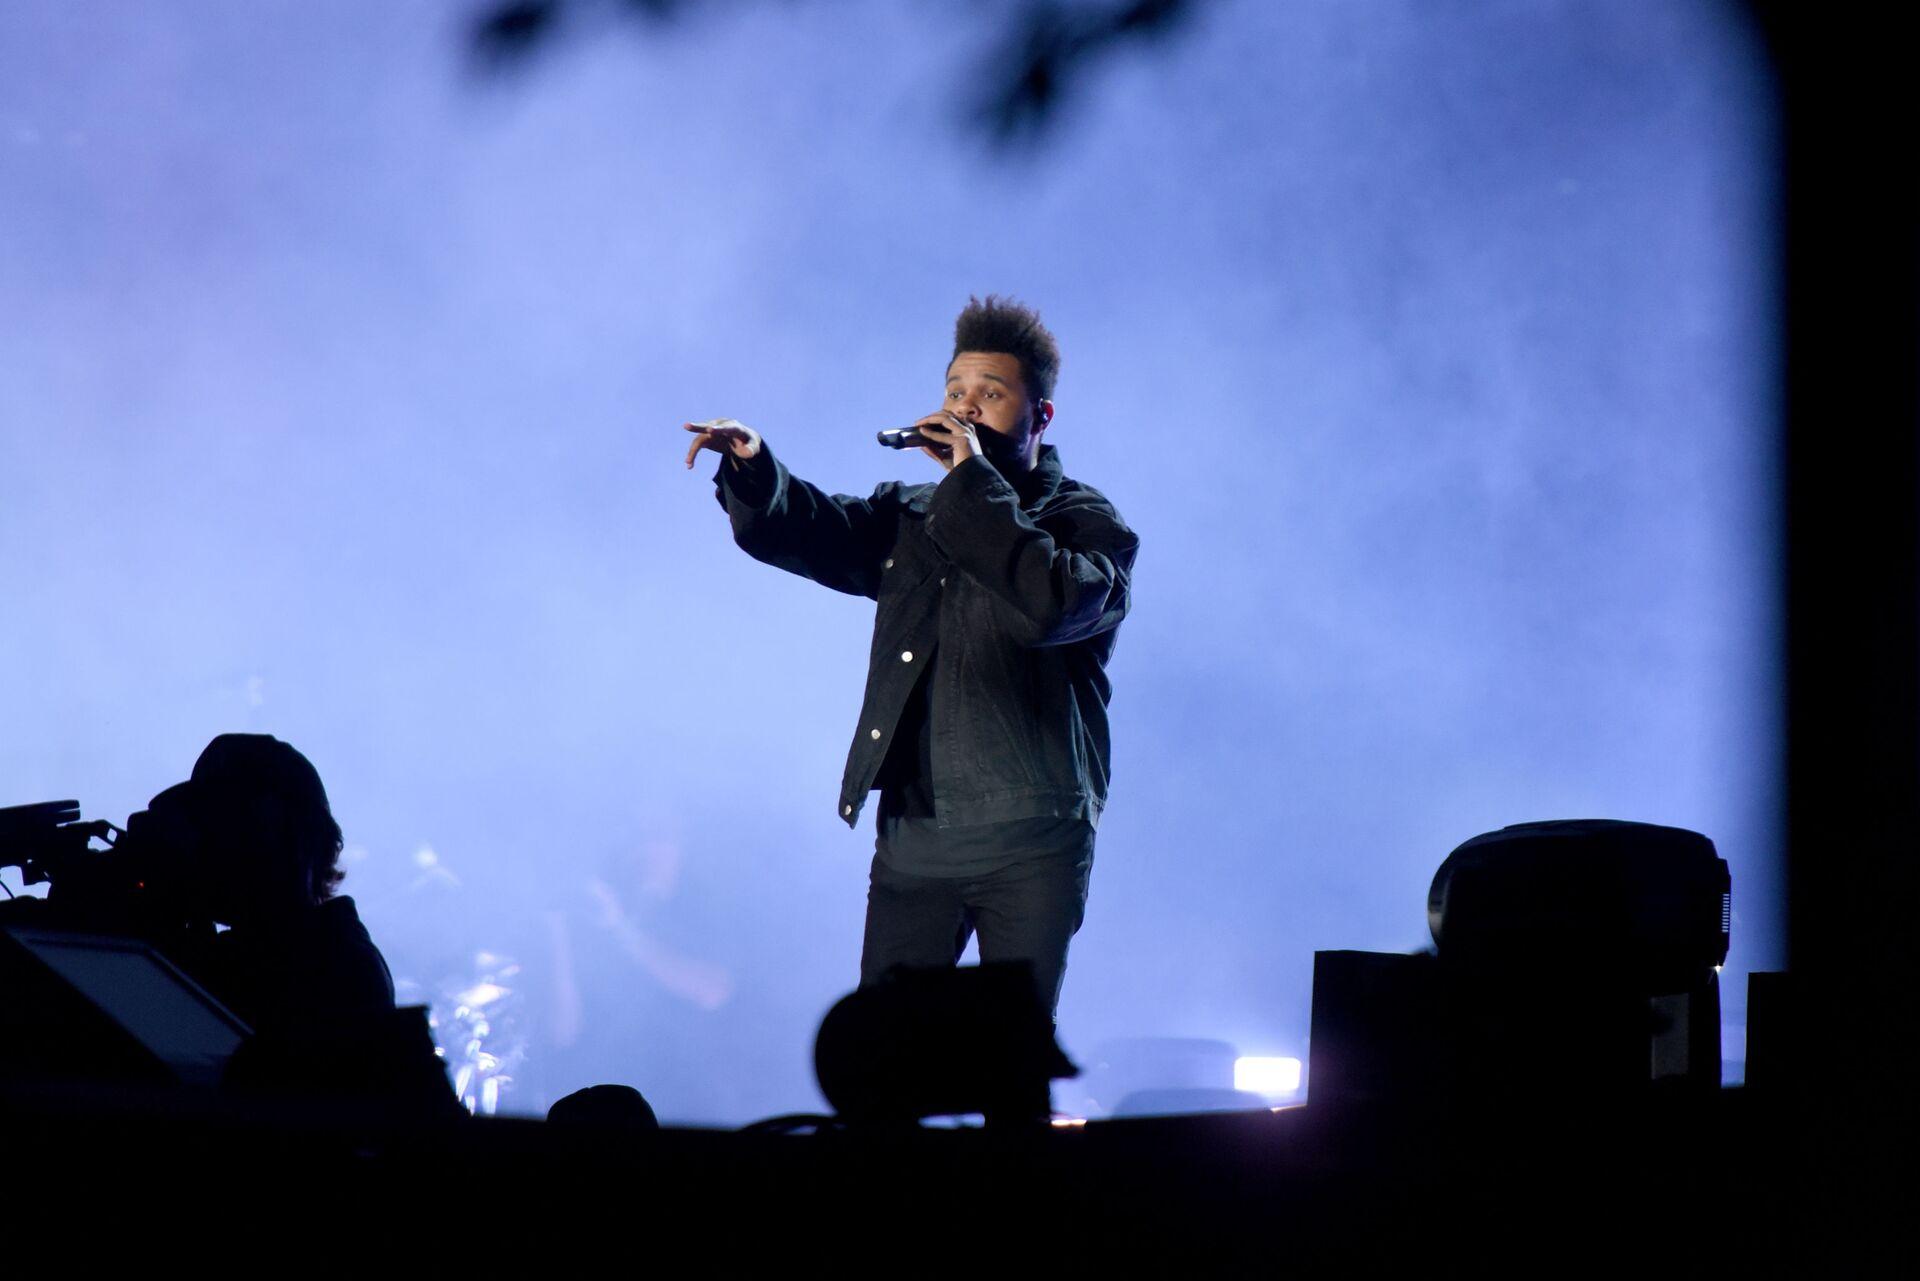 певец The Weeknd - Sputnik Грузия, 1920, 28.09.2021